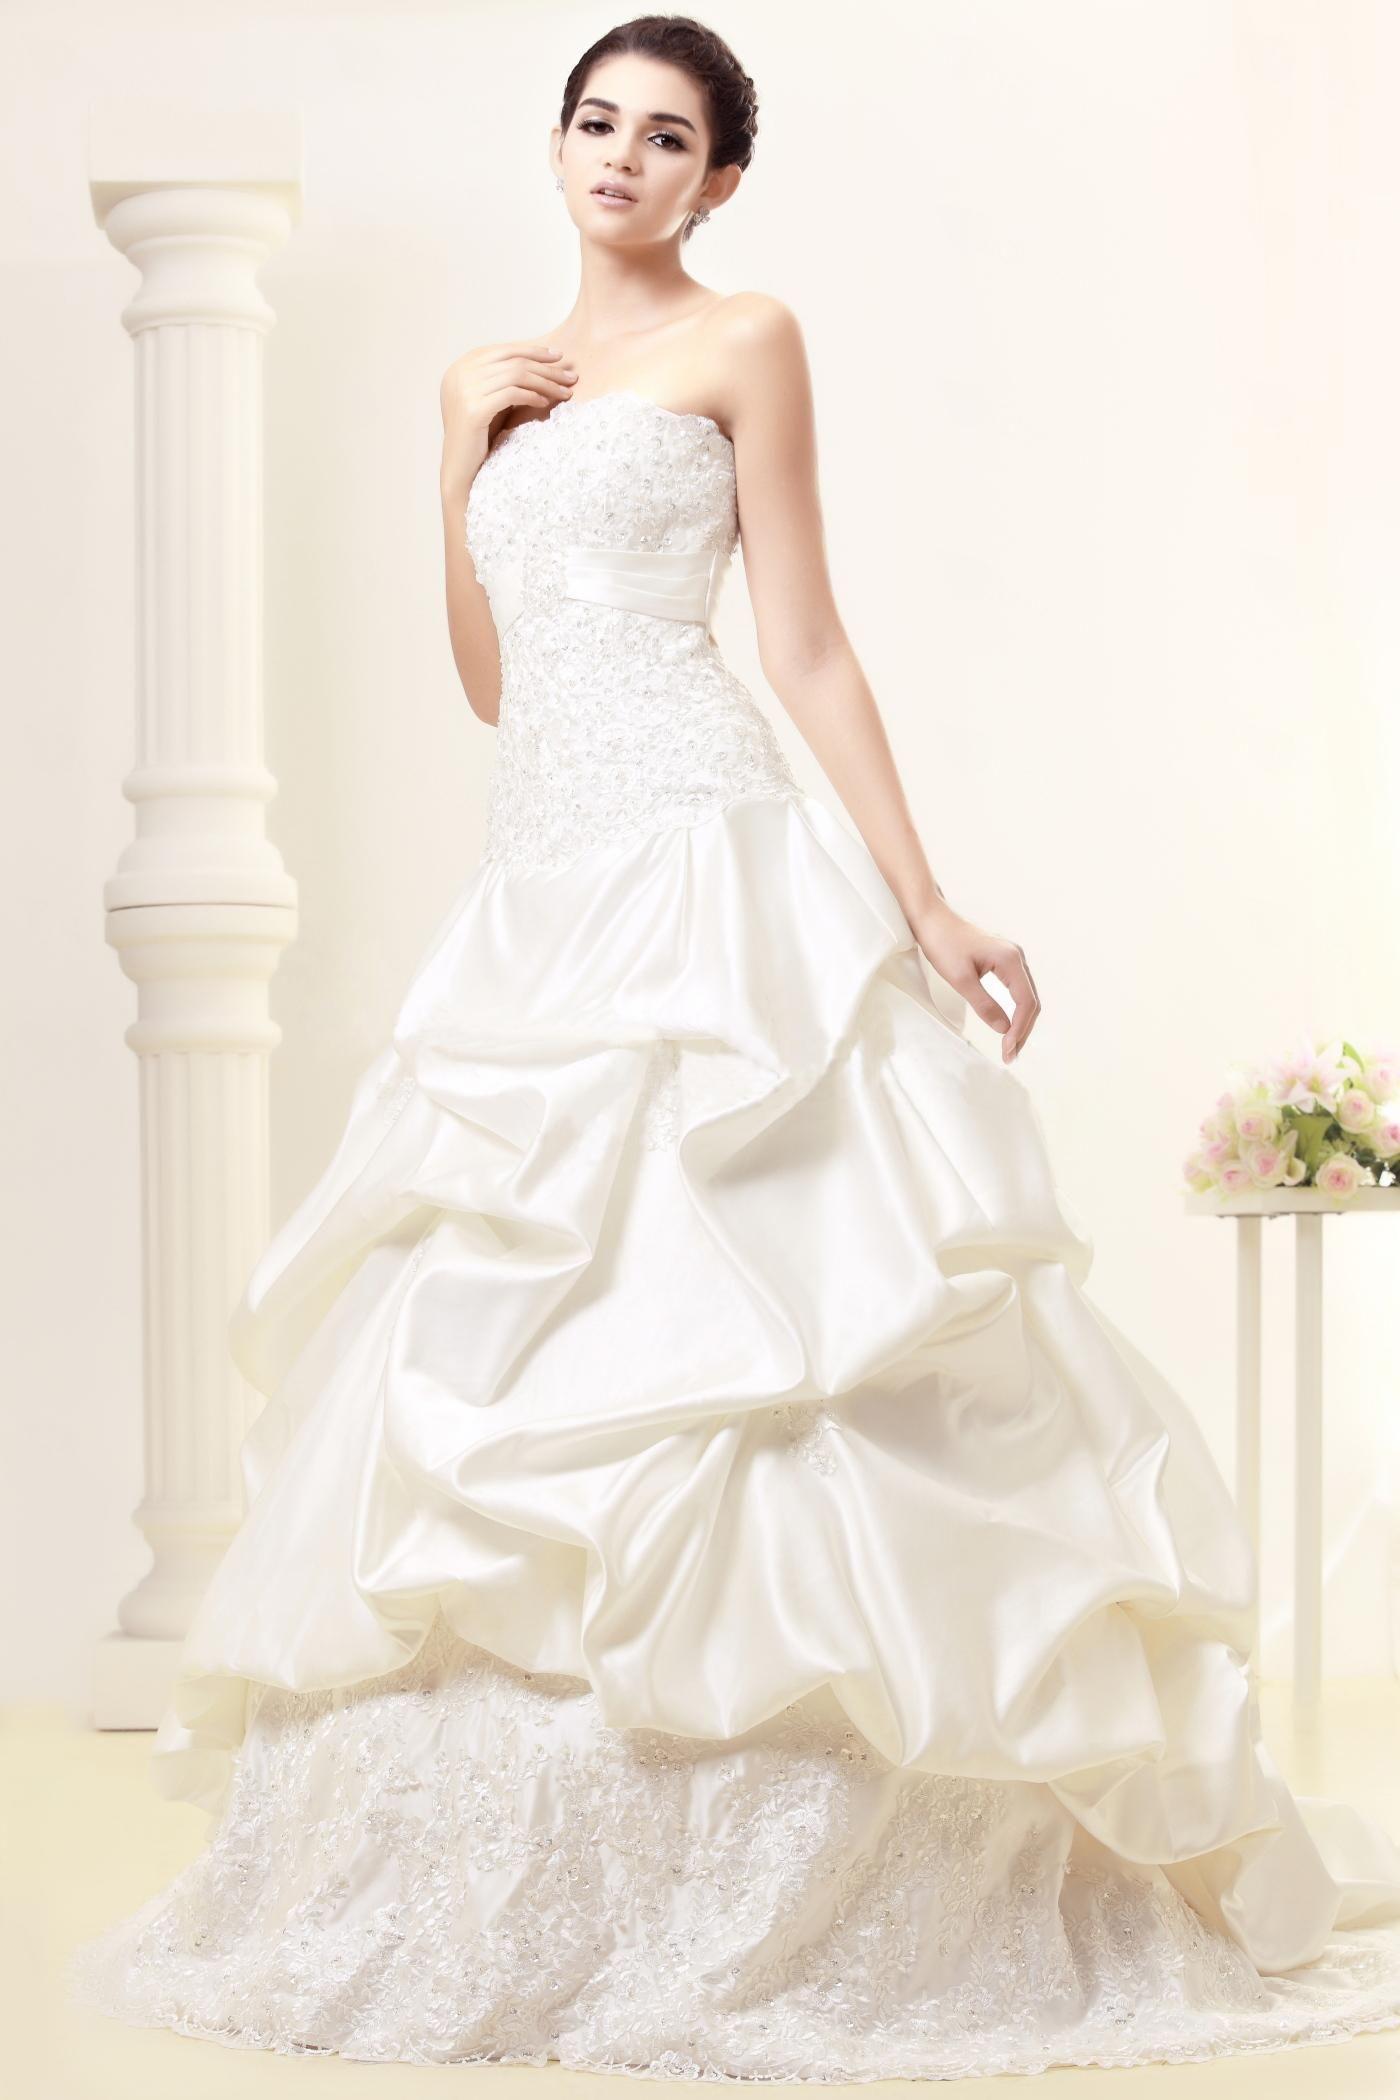 Pin by Breanna L'Huillier on Dream Wedding Buy wedding